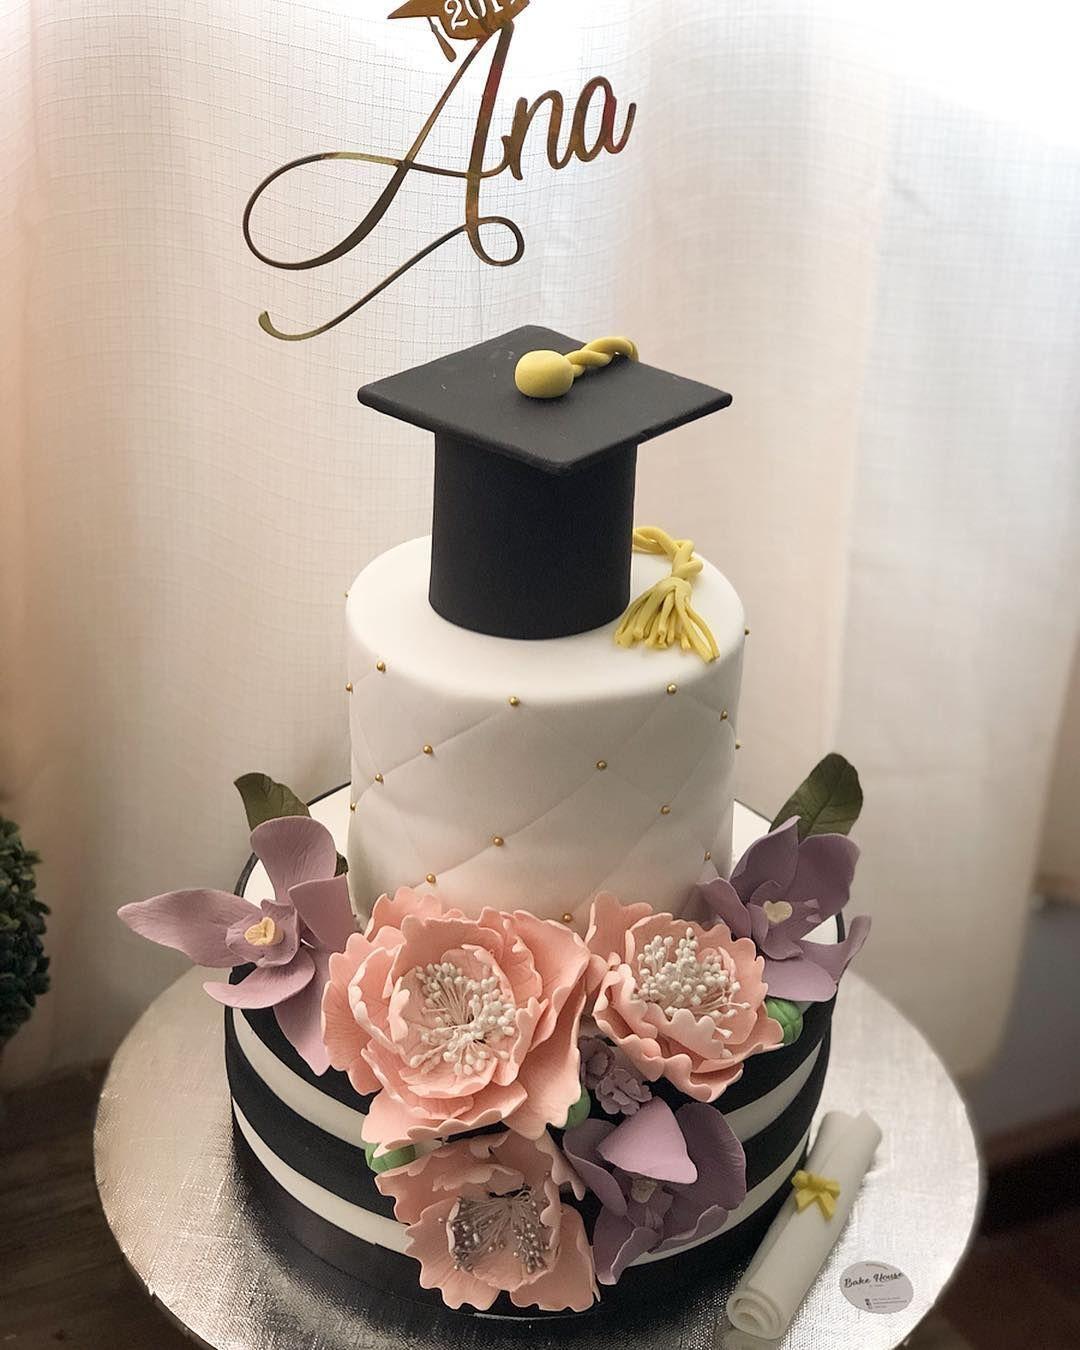 Graduation Cake Bakehousebywendy Graduation Graduacion Graduati Graduation Party Cake Graduation Cakes Graduation Party High